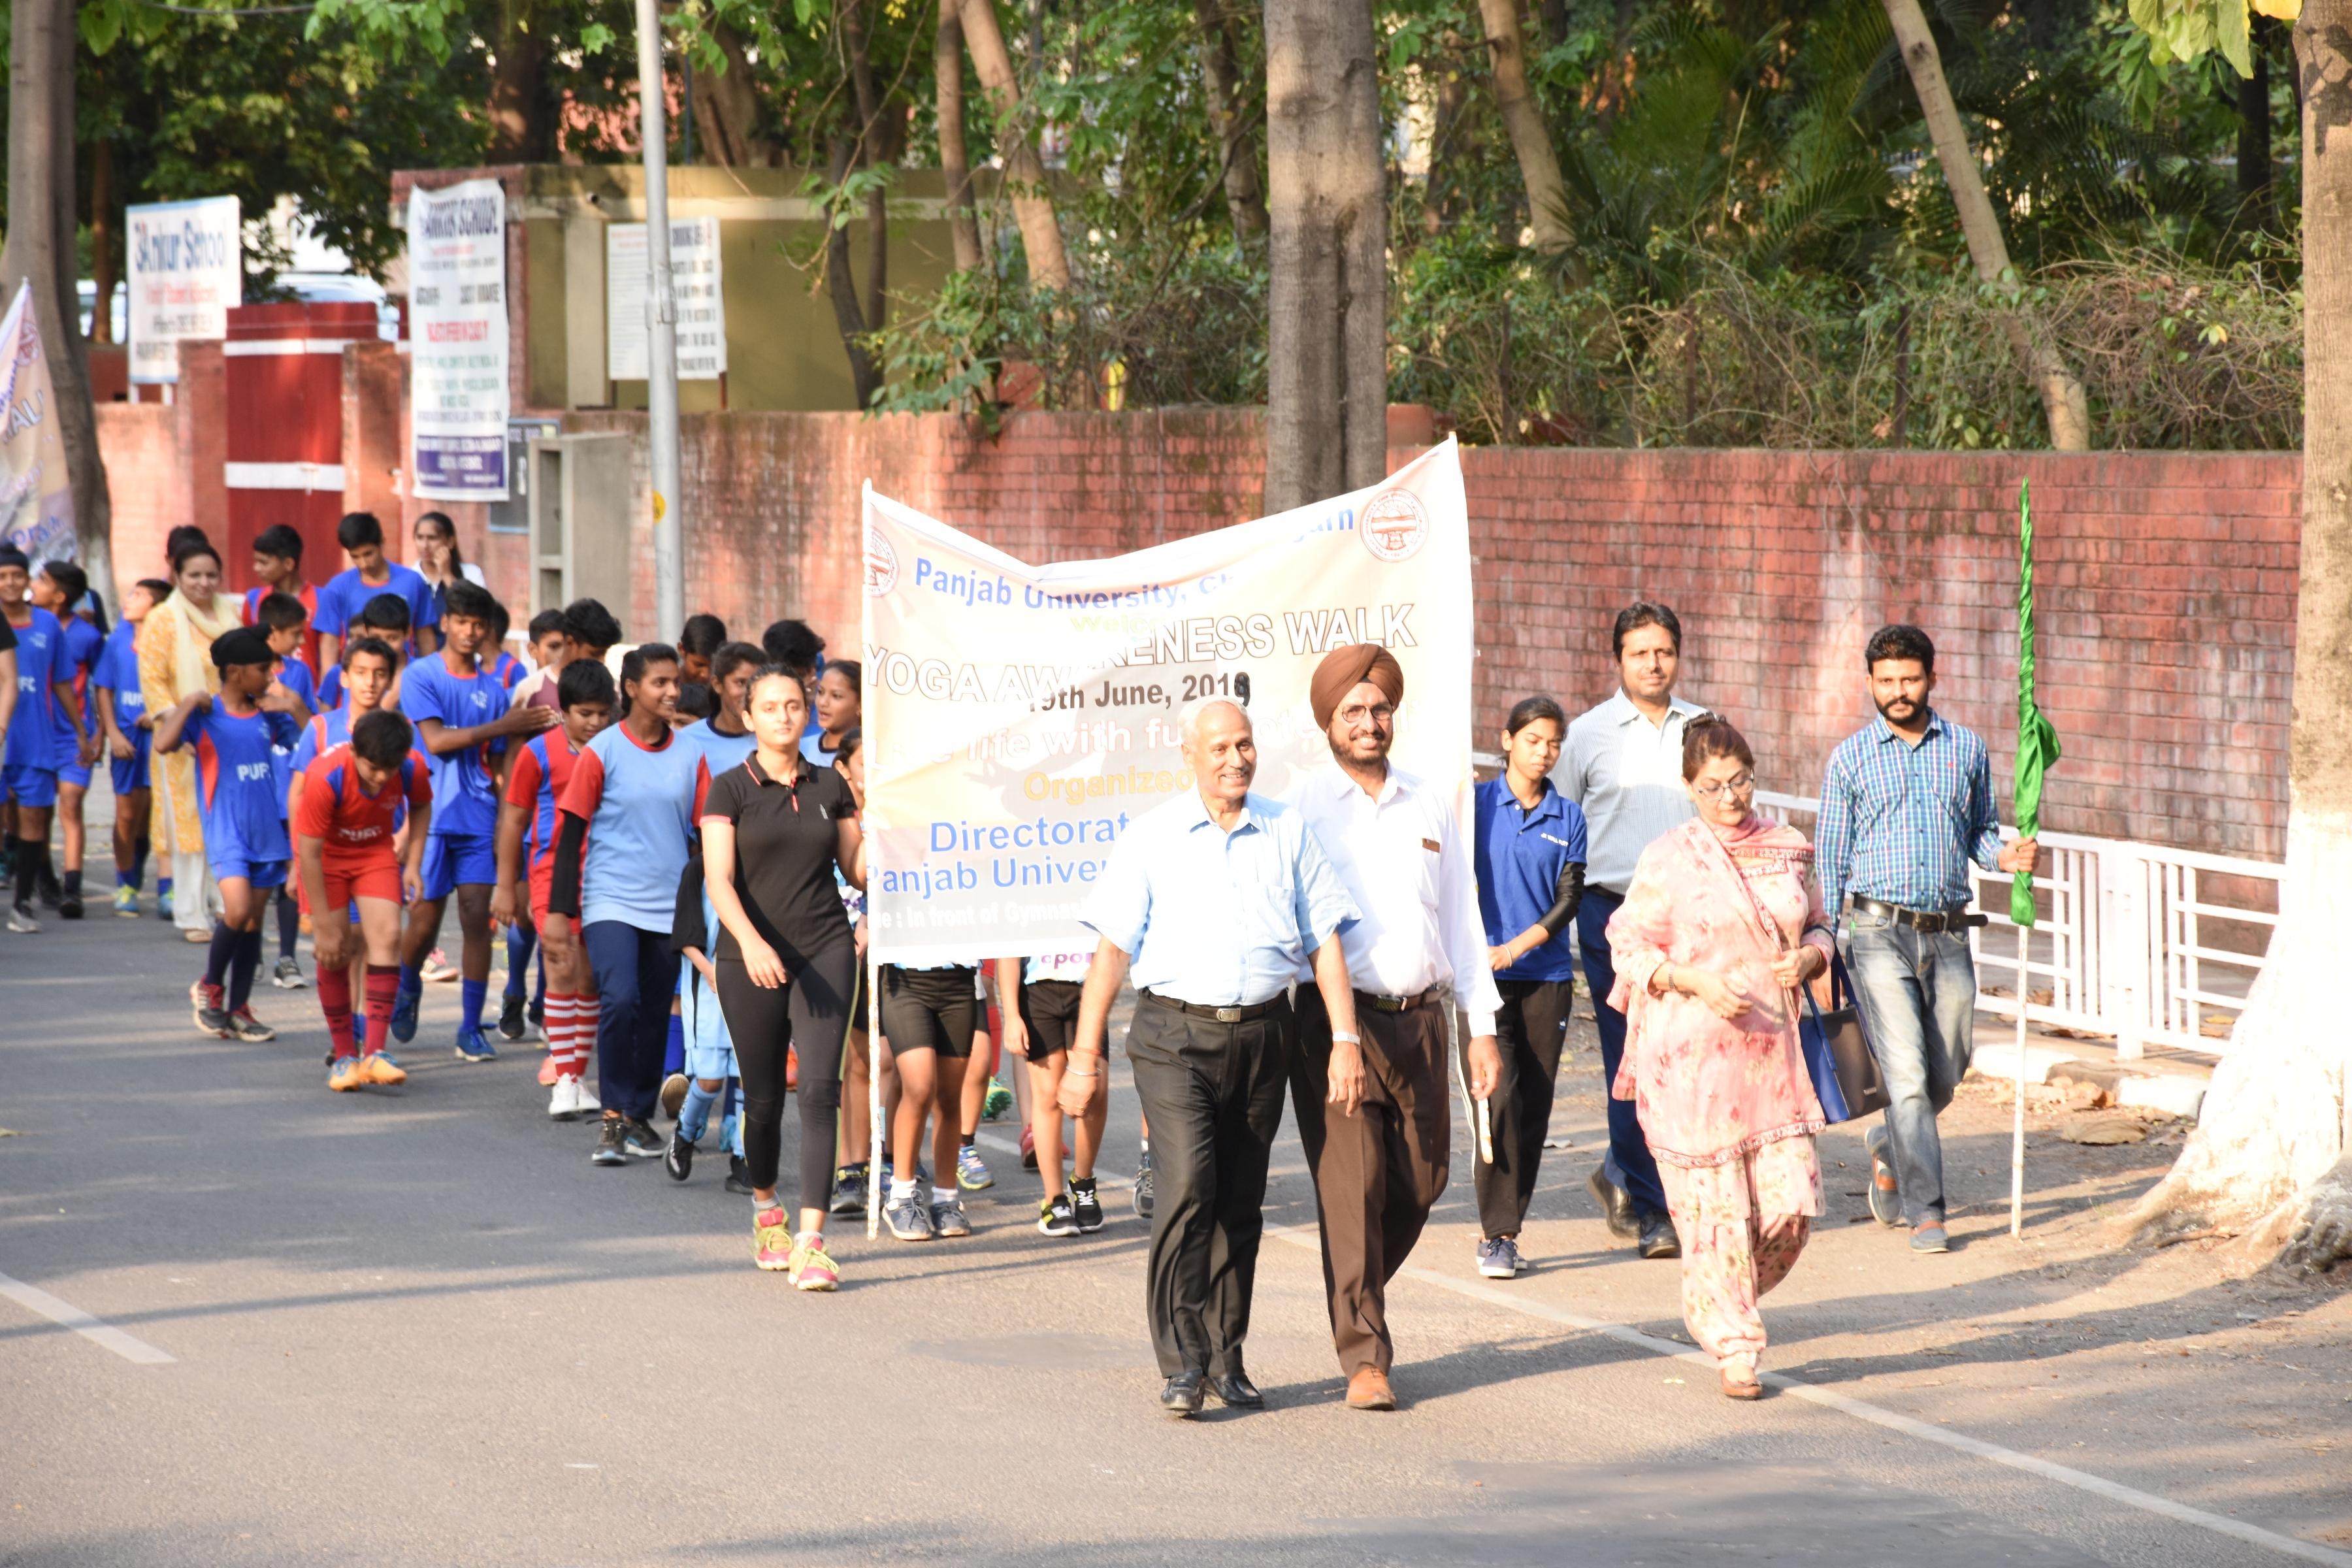 Panjab University, Chandigarh  to celebrate  internationalYoga Day on June 21, 2019, at Gymnasium Hall